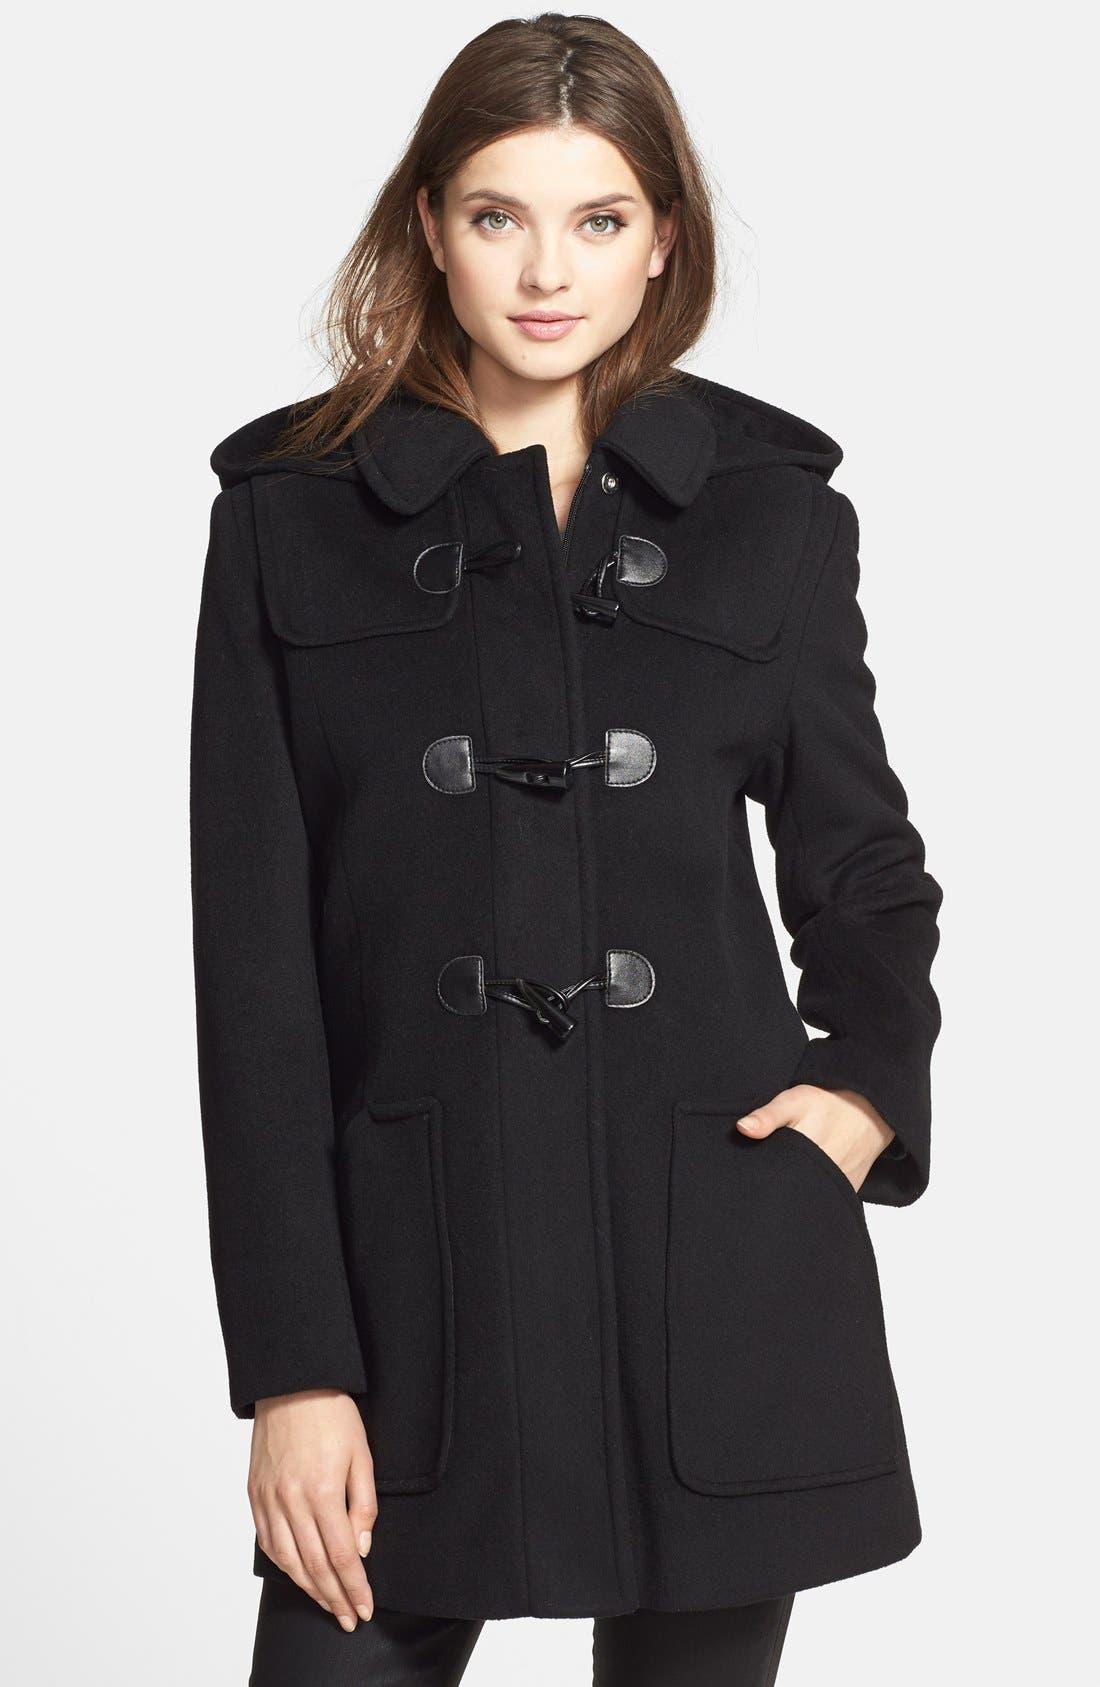 Removable Hood Wool Blend Duffle Coat,                             Main thumbnail 1, color,                             001